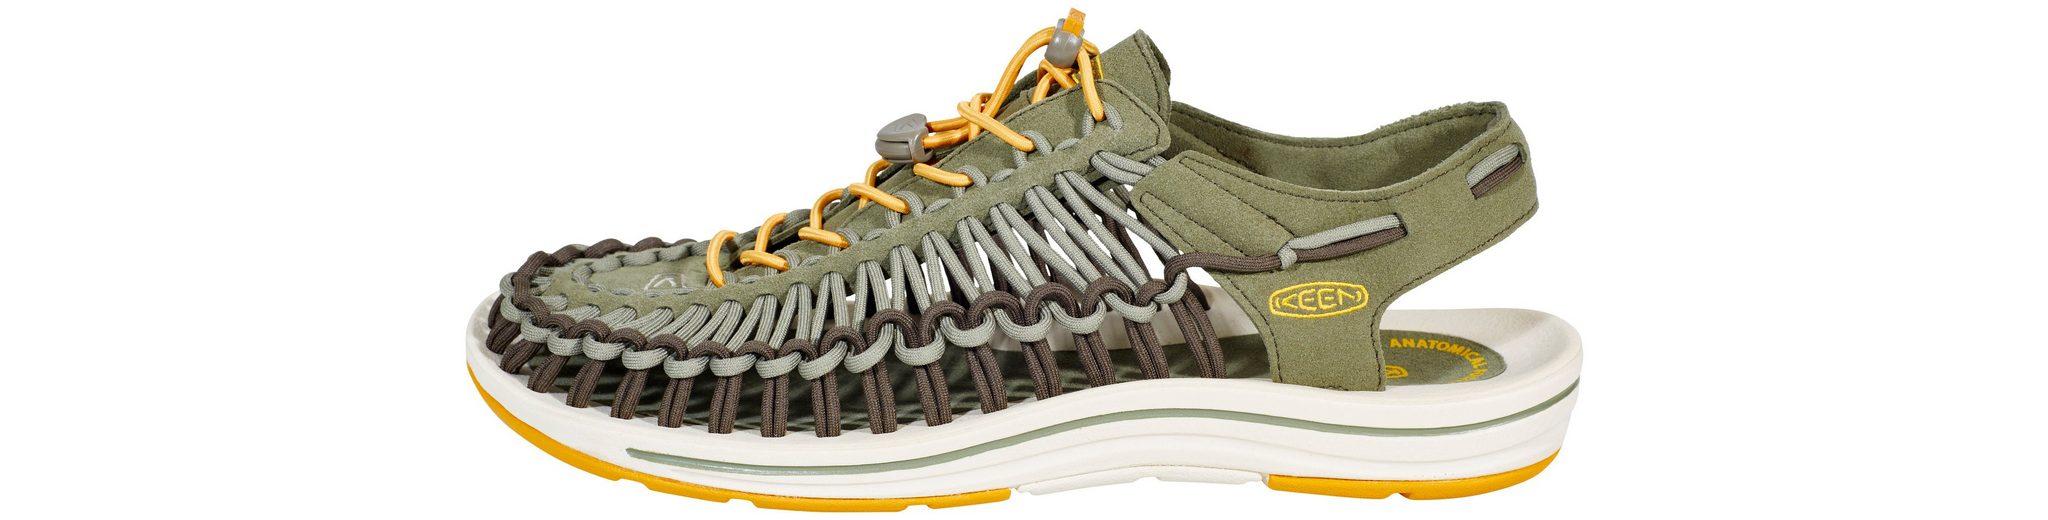 Footlocker Online Keen Sandale Uneek Sandals Men Großhandelspreis Verkauf Online Spielraum Store Günstiger Preis LE3EY